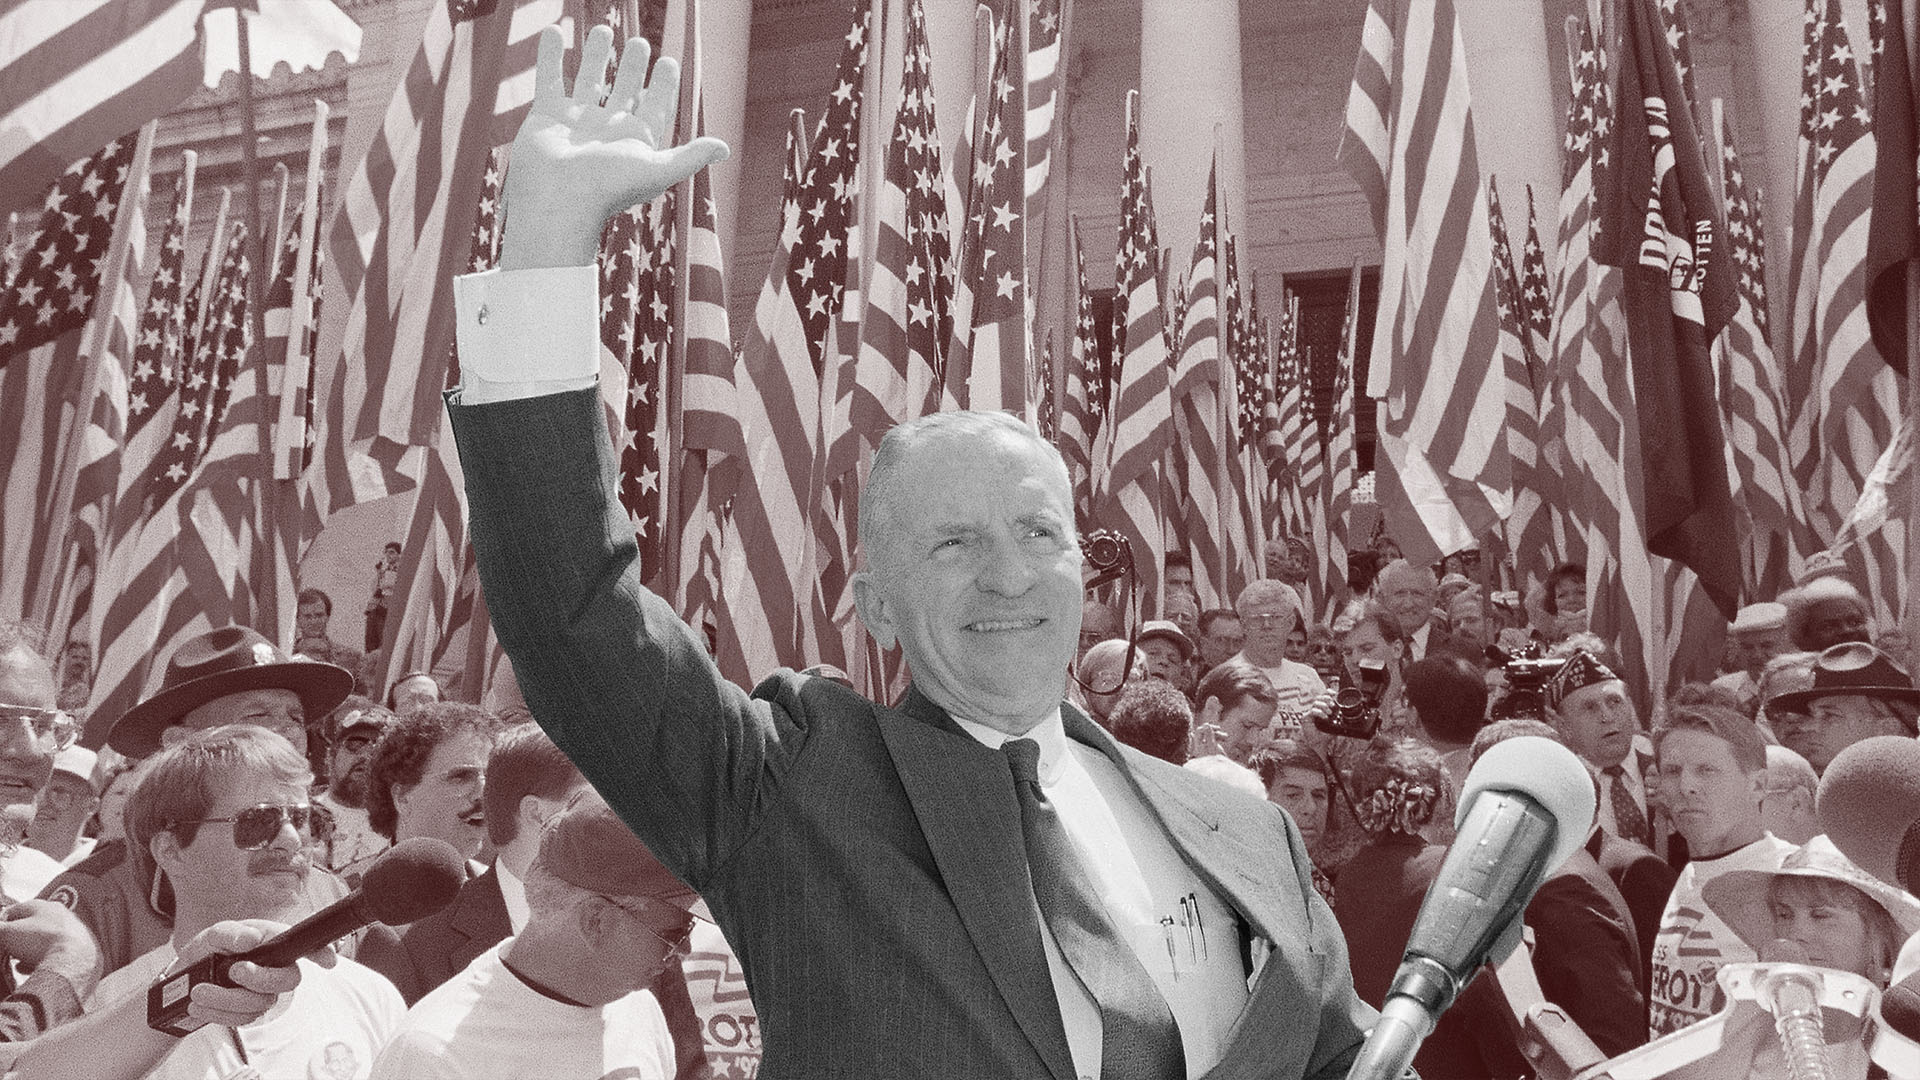 Ross Perot | Bio & Timeline